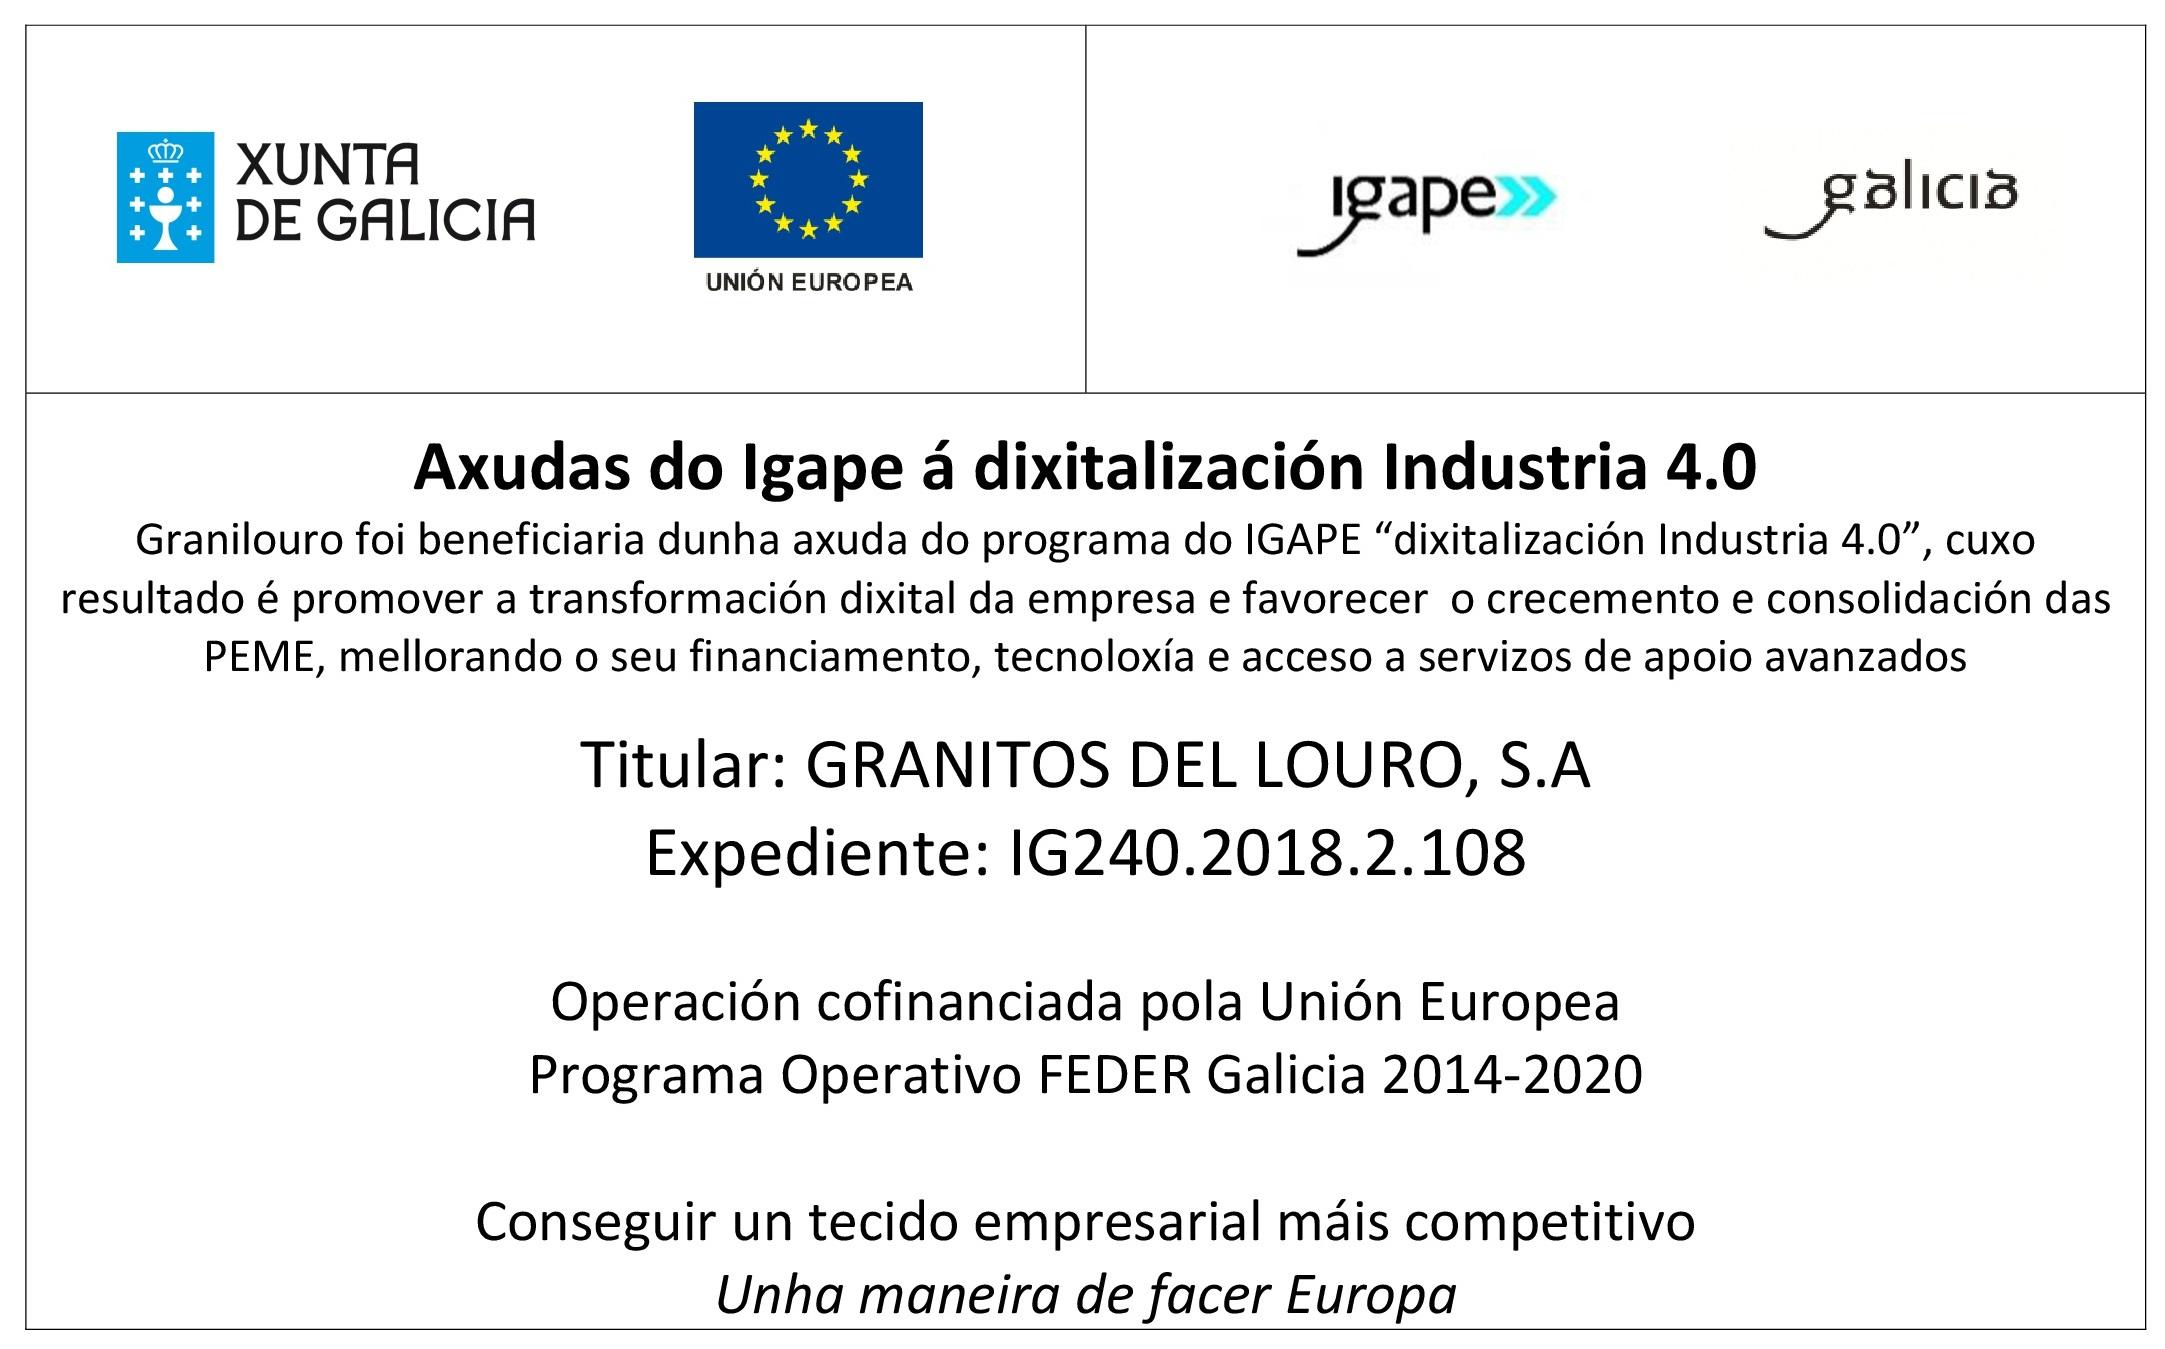 IGAPE_INDUSTRIA_4.0_GRANILOURO